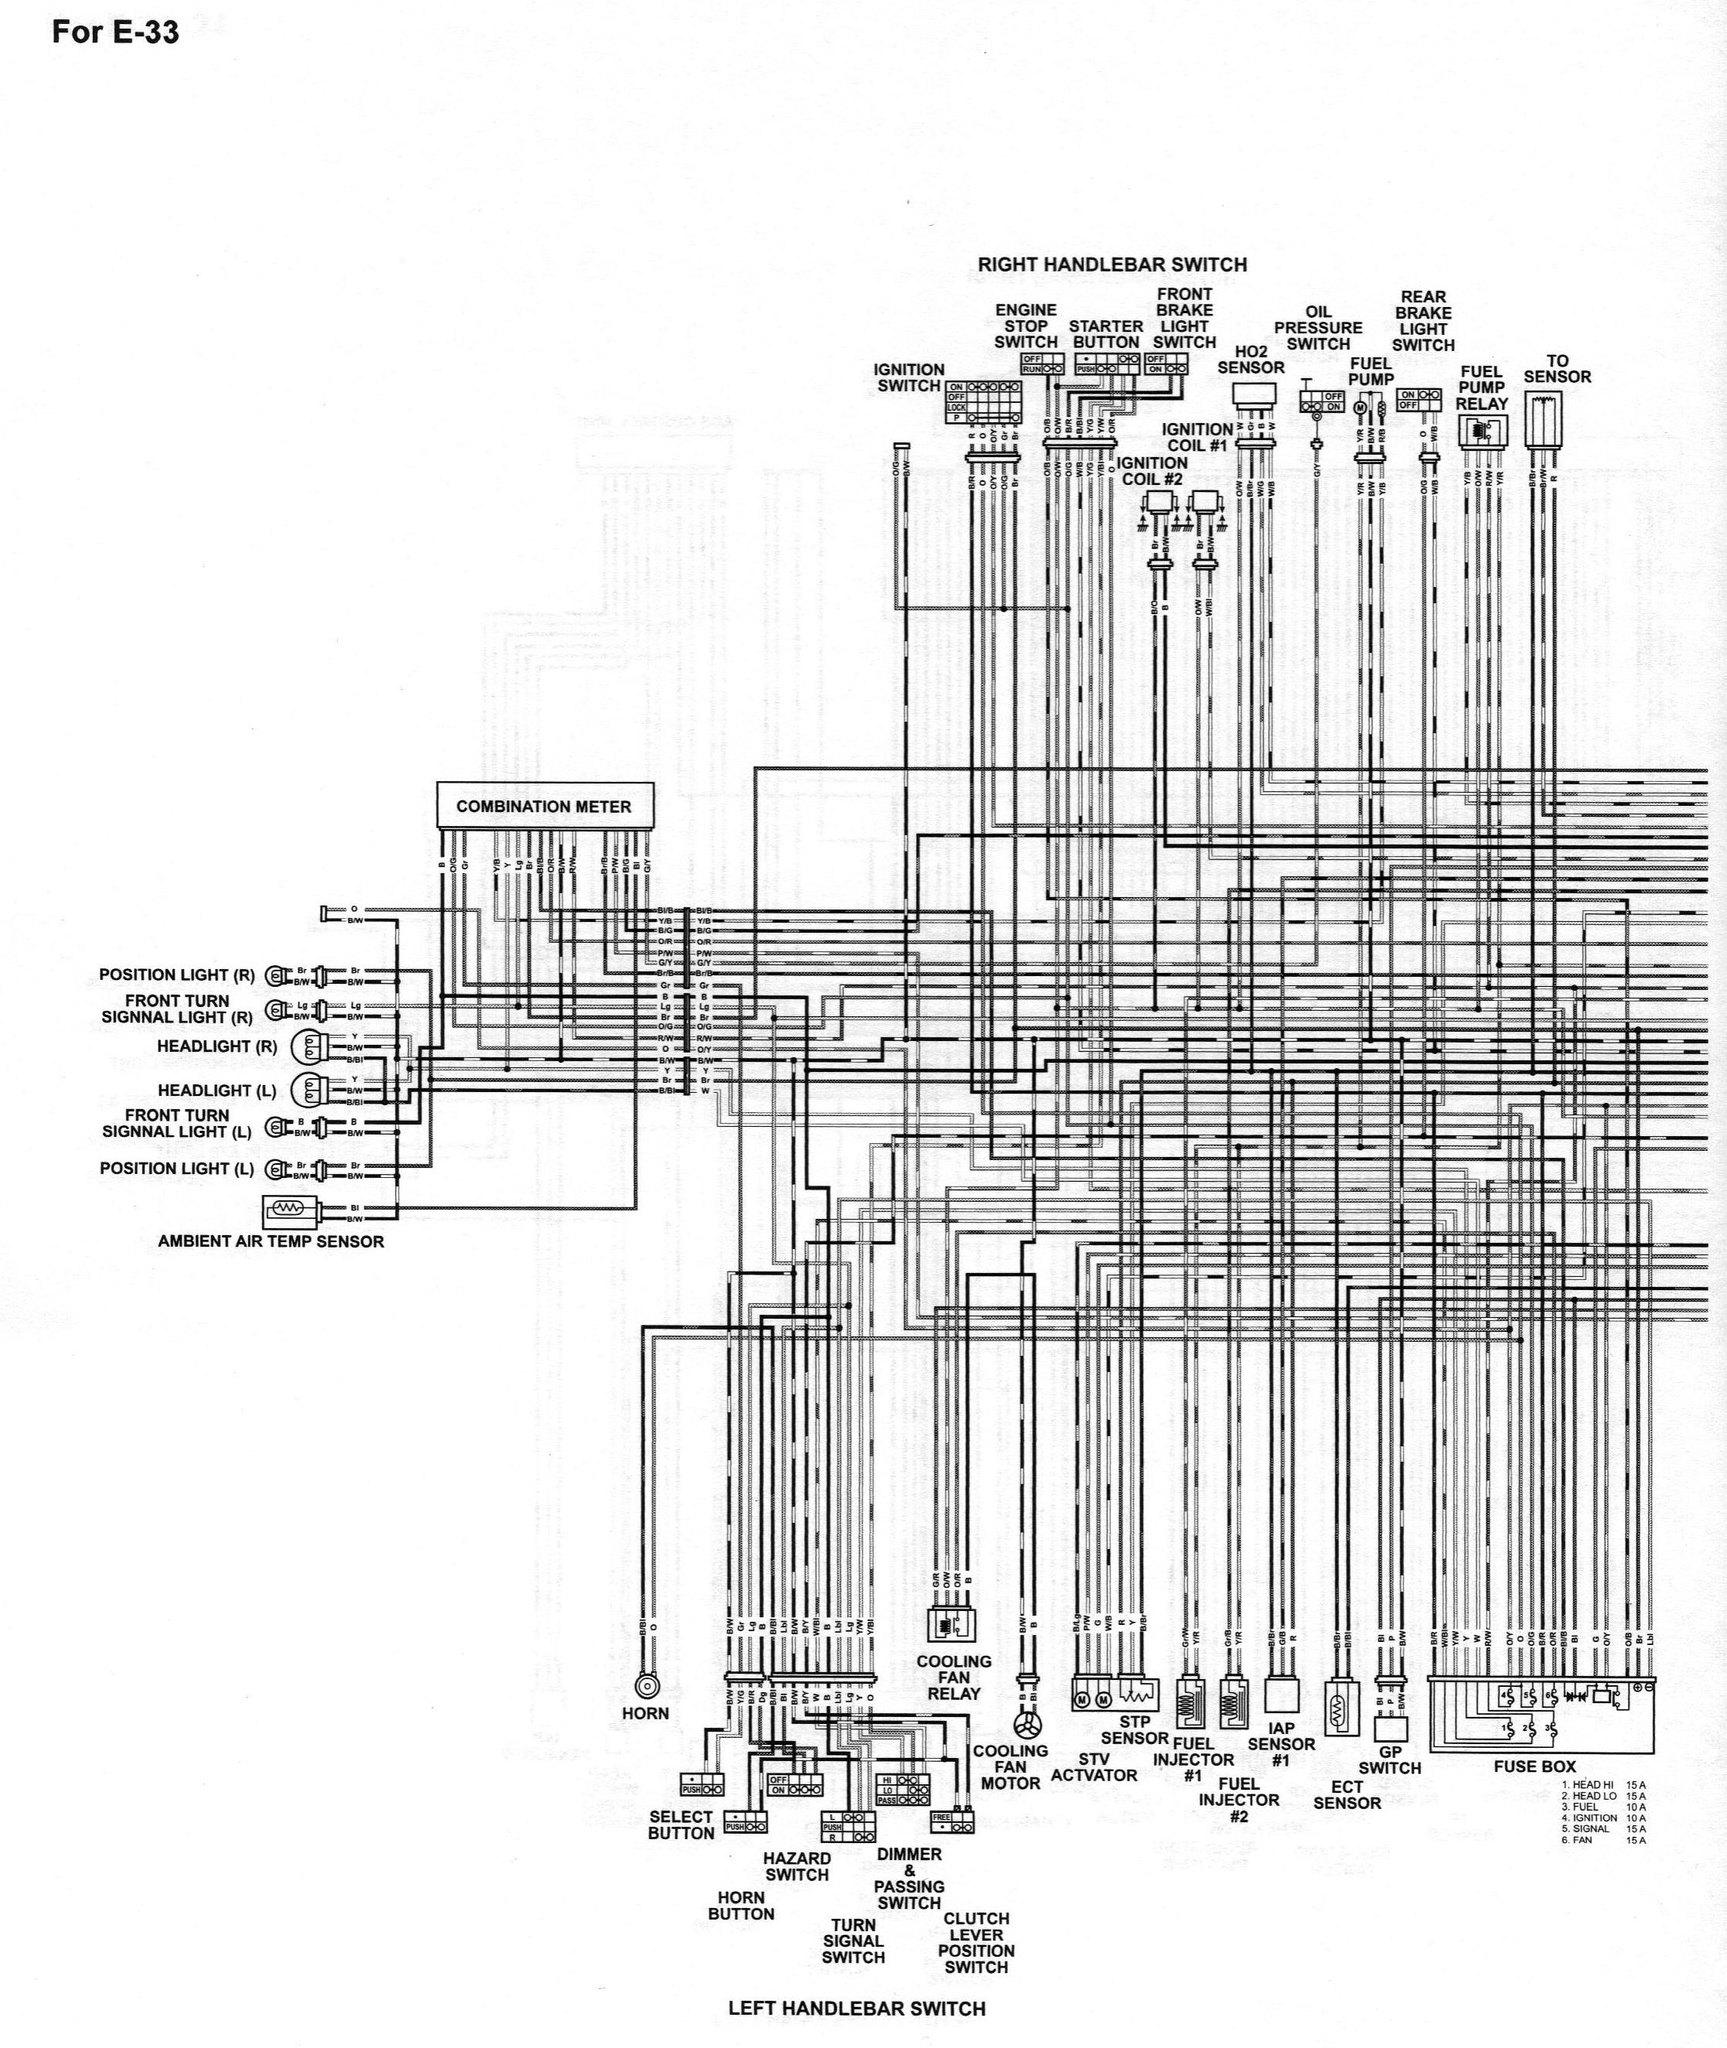 suzuki 2012 650 v strom wiring diagram